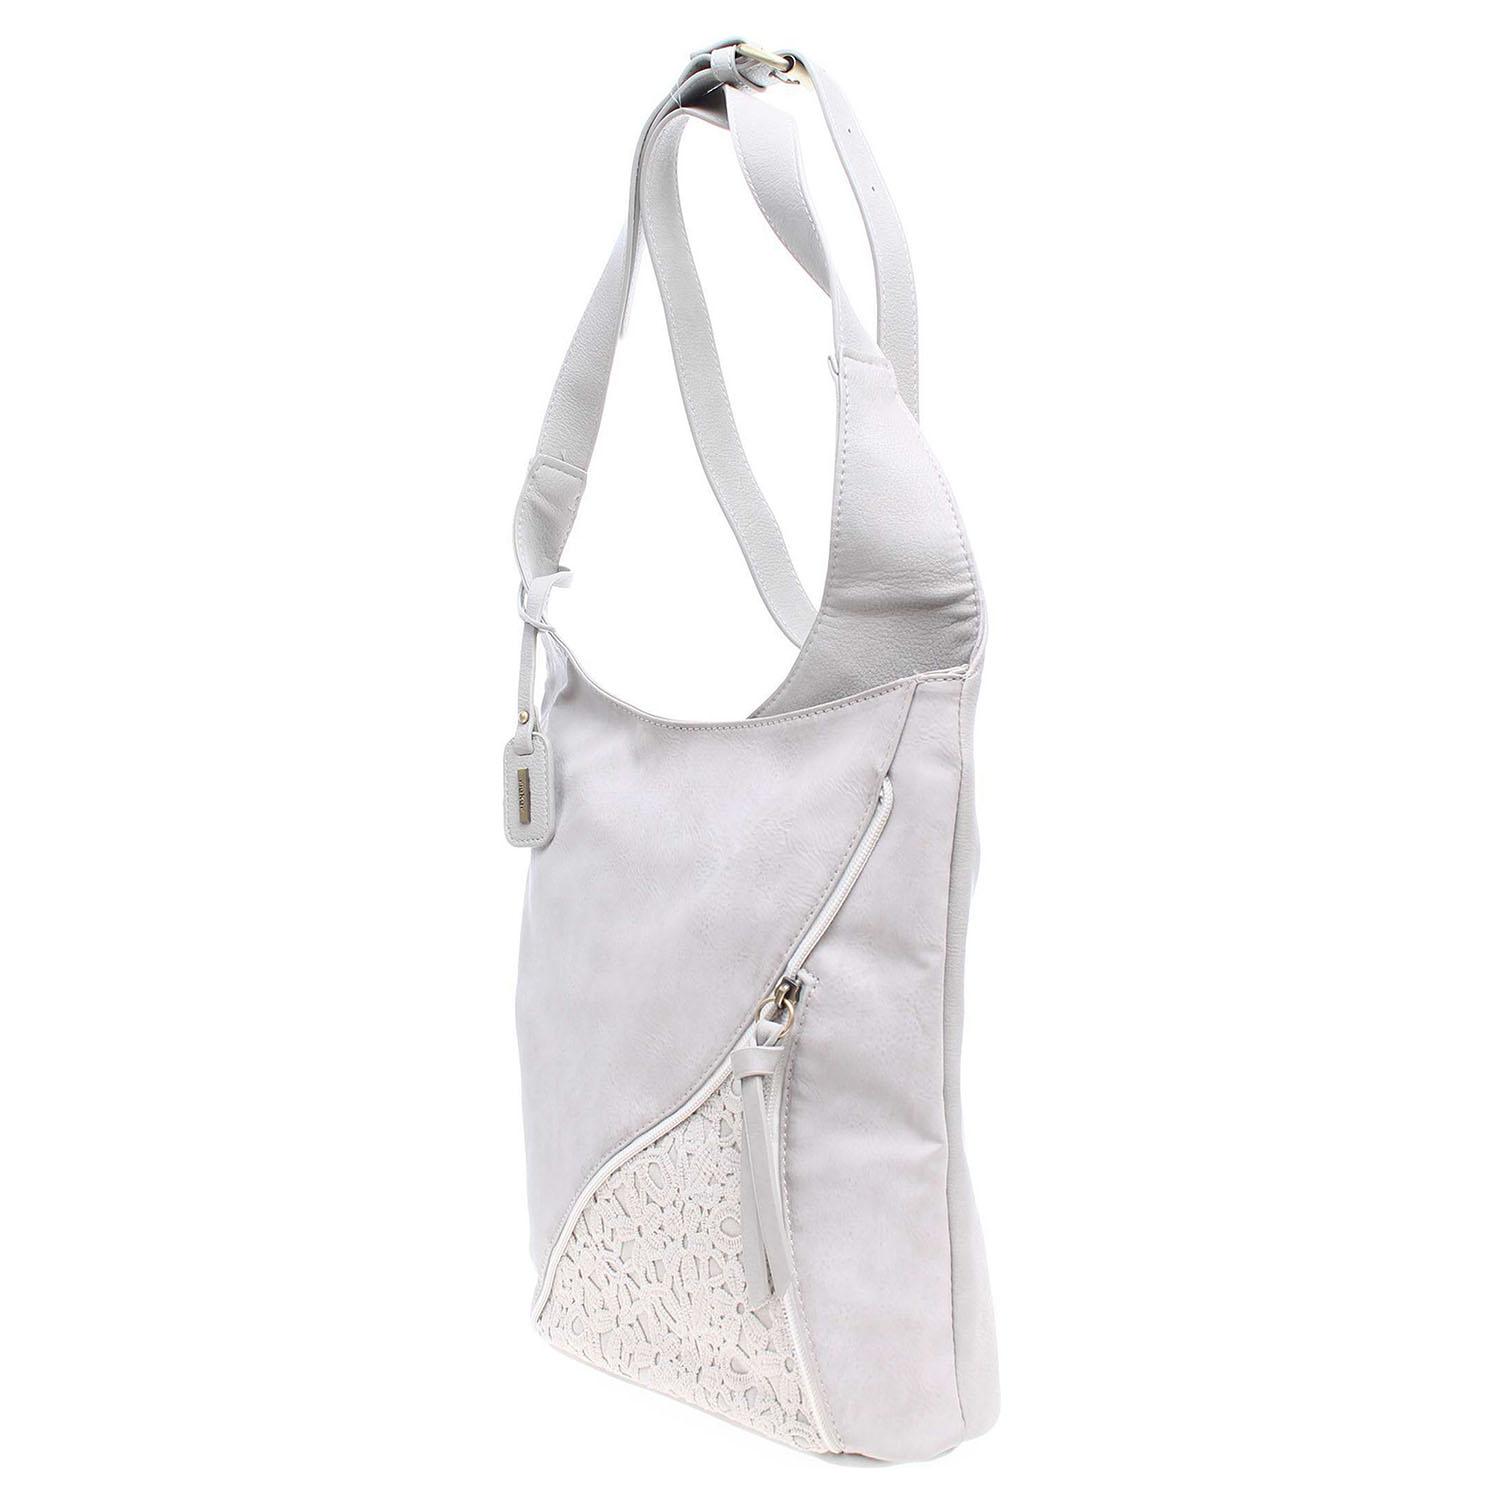 Ecco Rieker dámská kabelka H1428-40 šedá 11891122